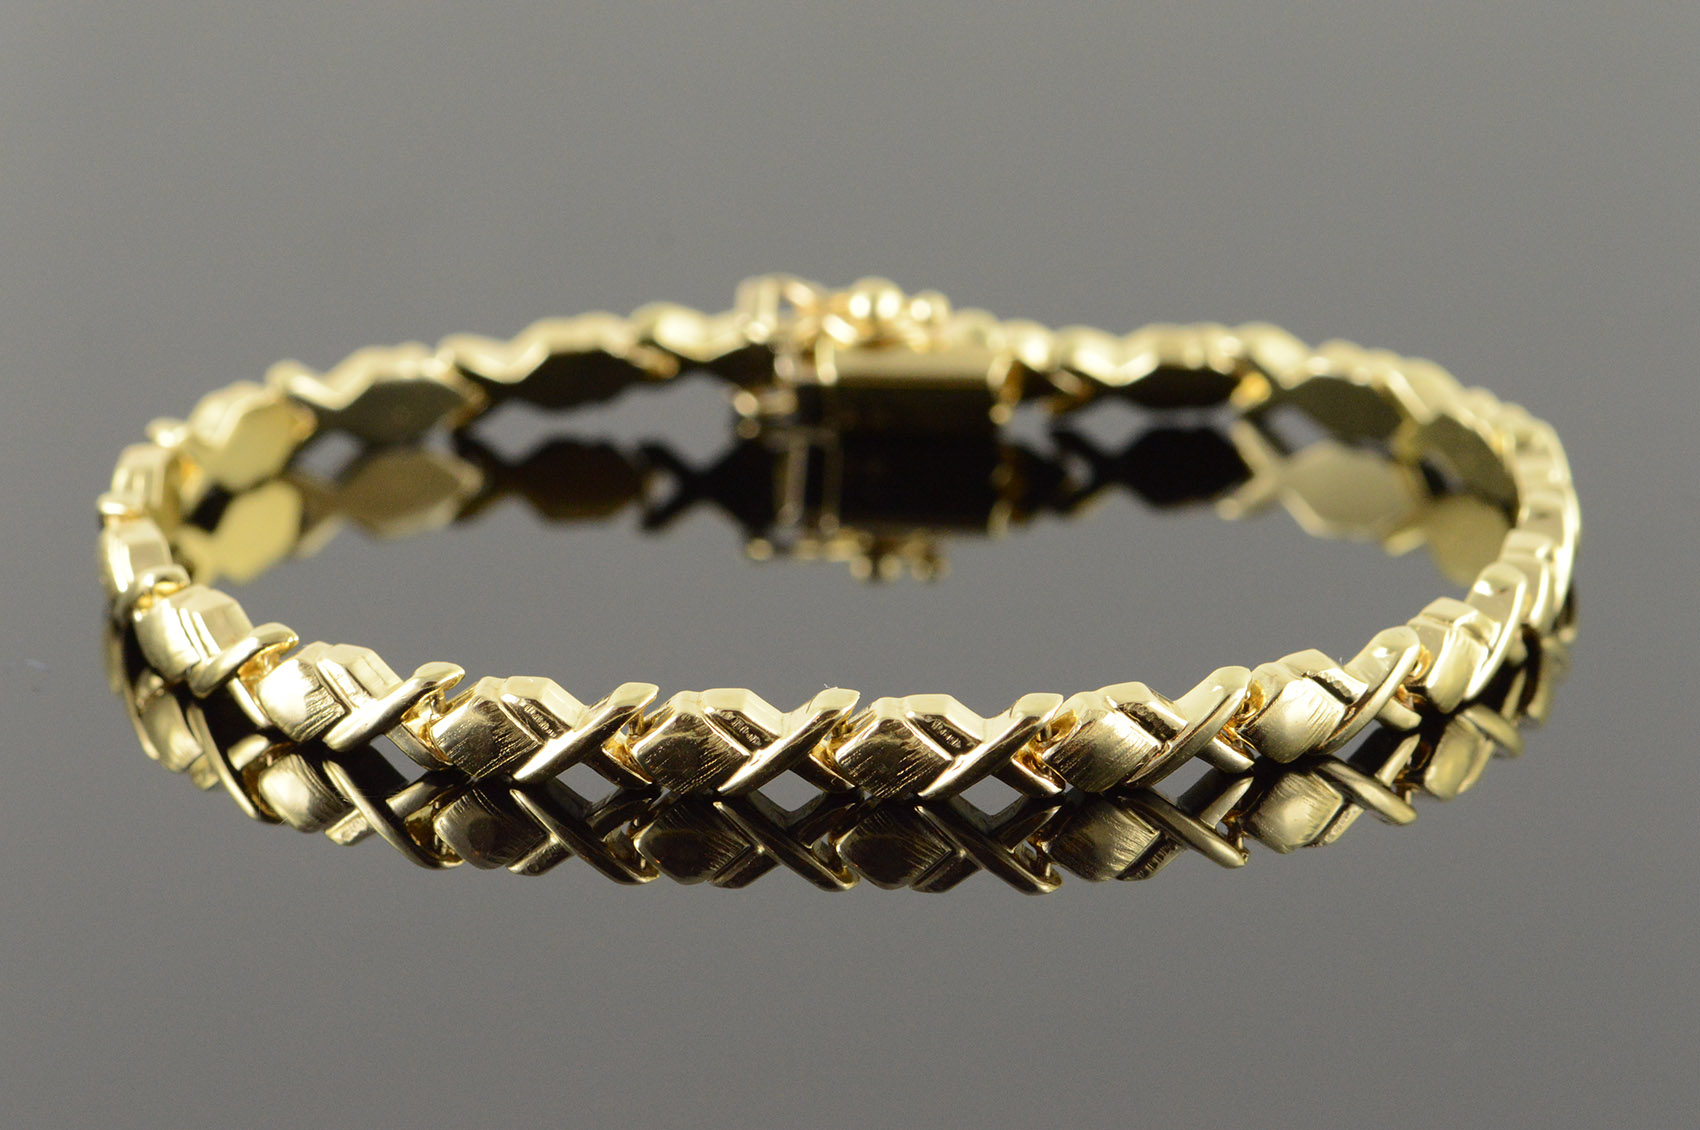 e8d0bd41105116 14K Heavy Designer - Black Onyx Mother of Pearl Bangle Yellow Gold ...